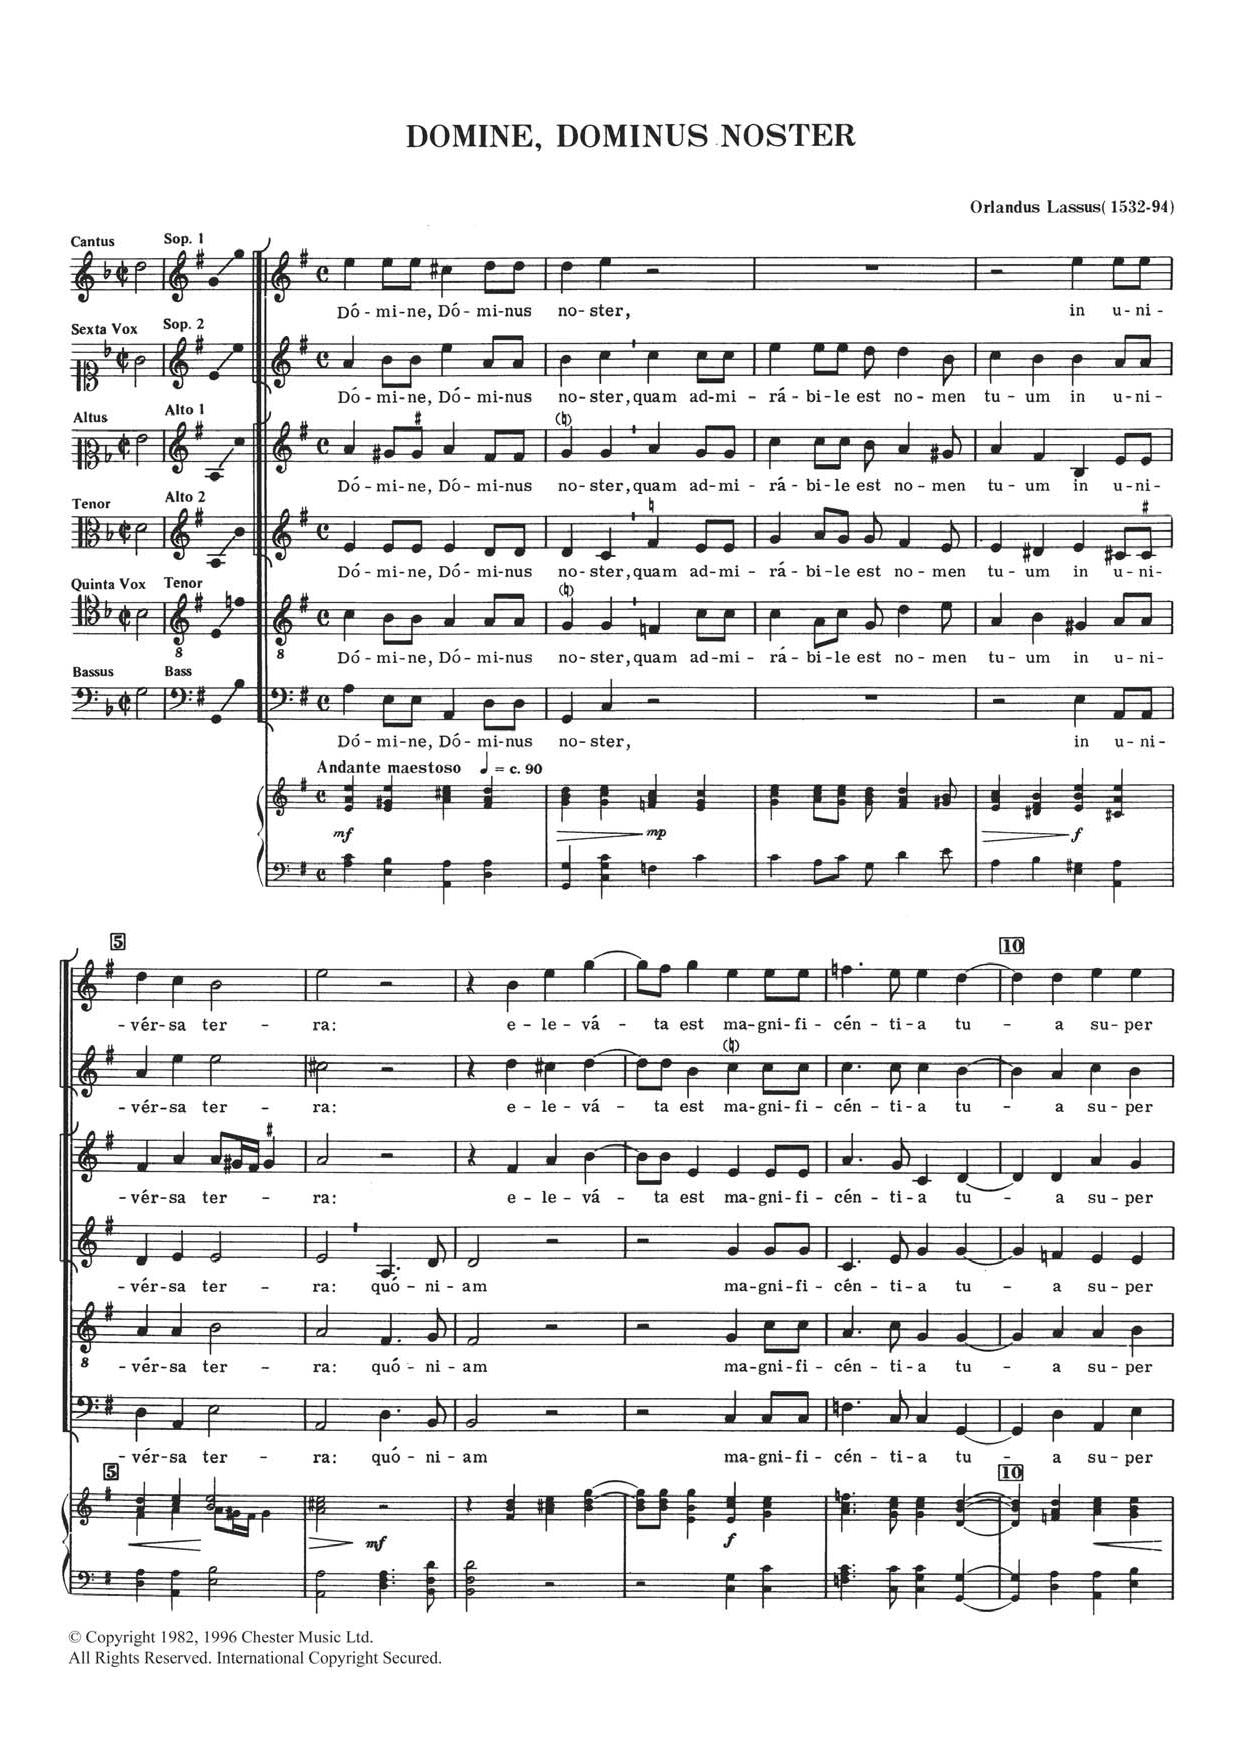 Domine, Dominus Noster Sheet Music